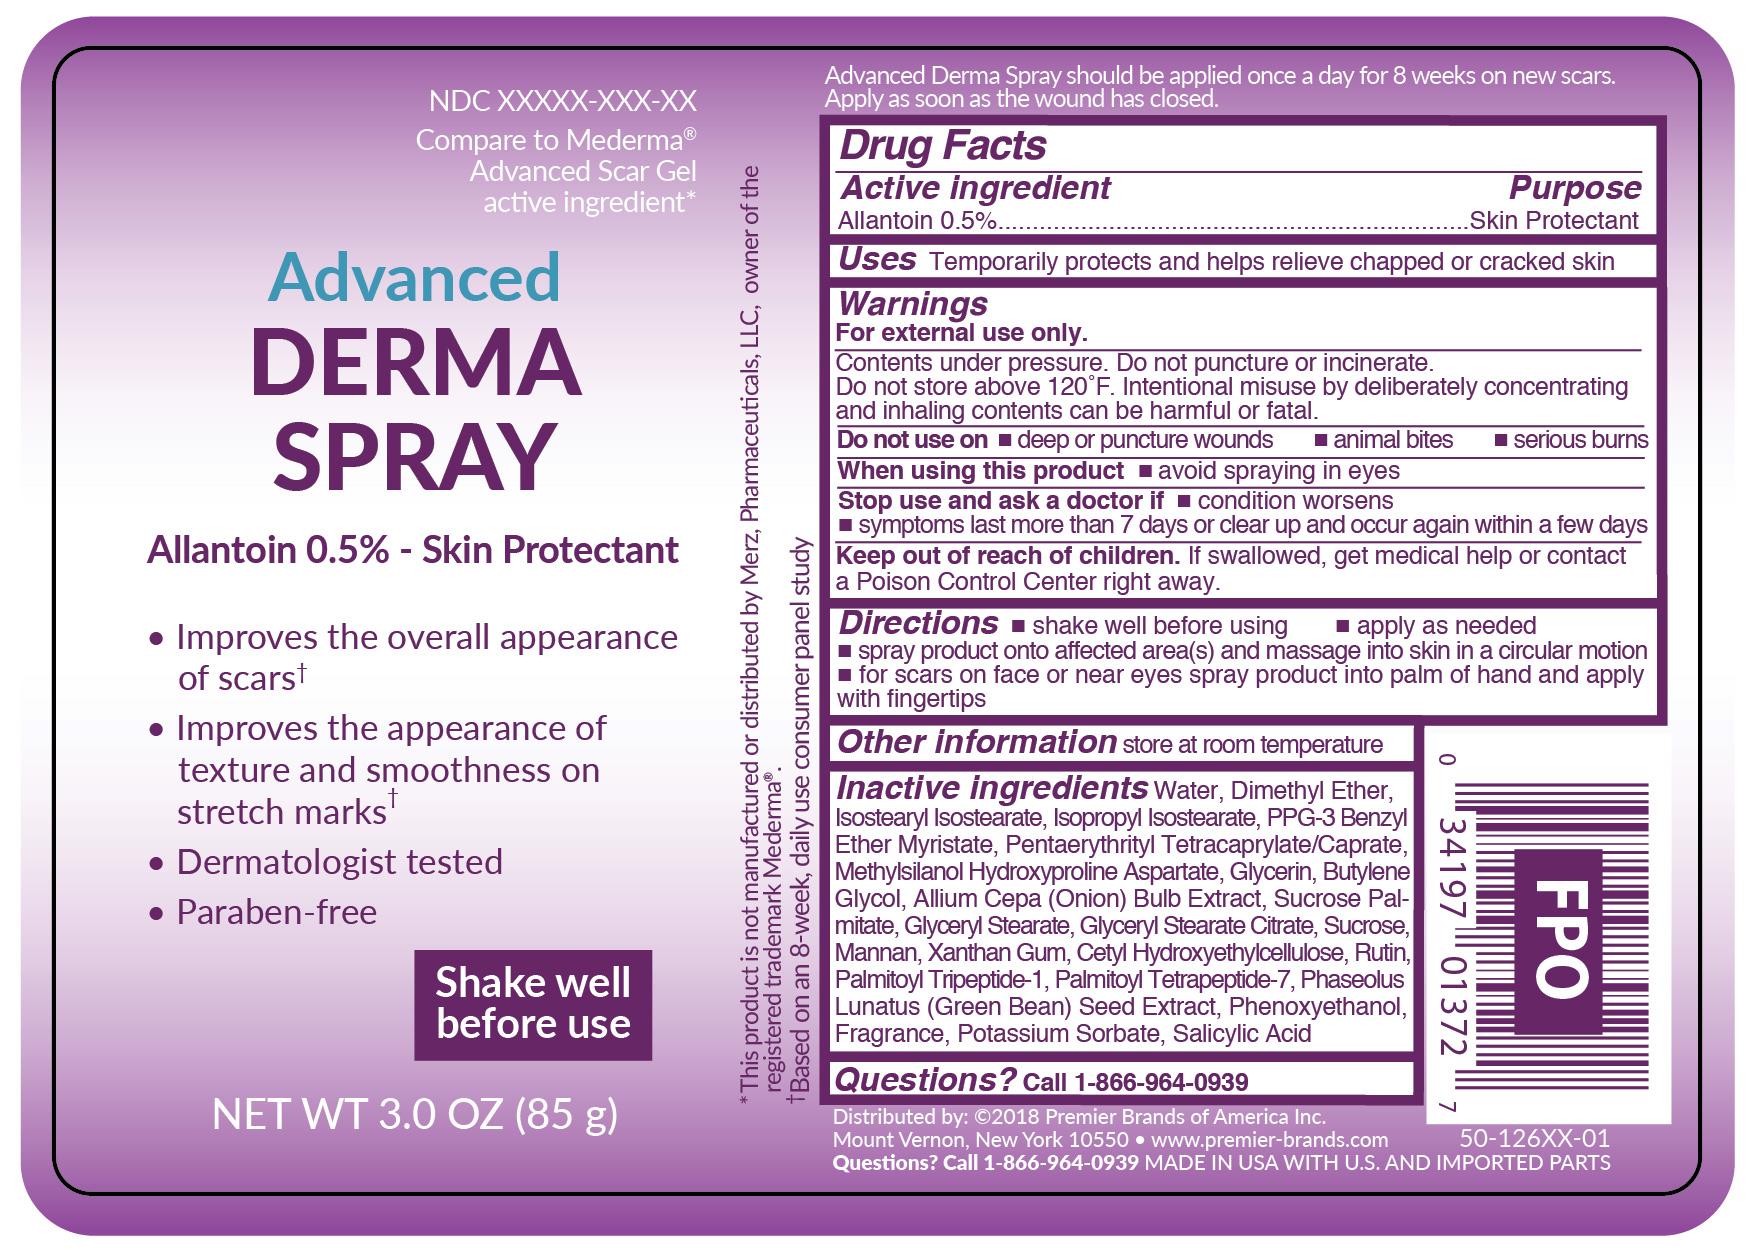 Generic_Advanced Derma Spray_50-126XX-01.jpg